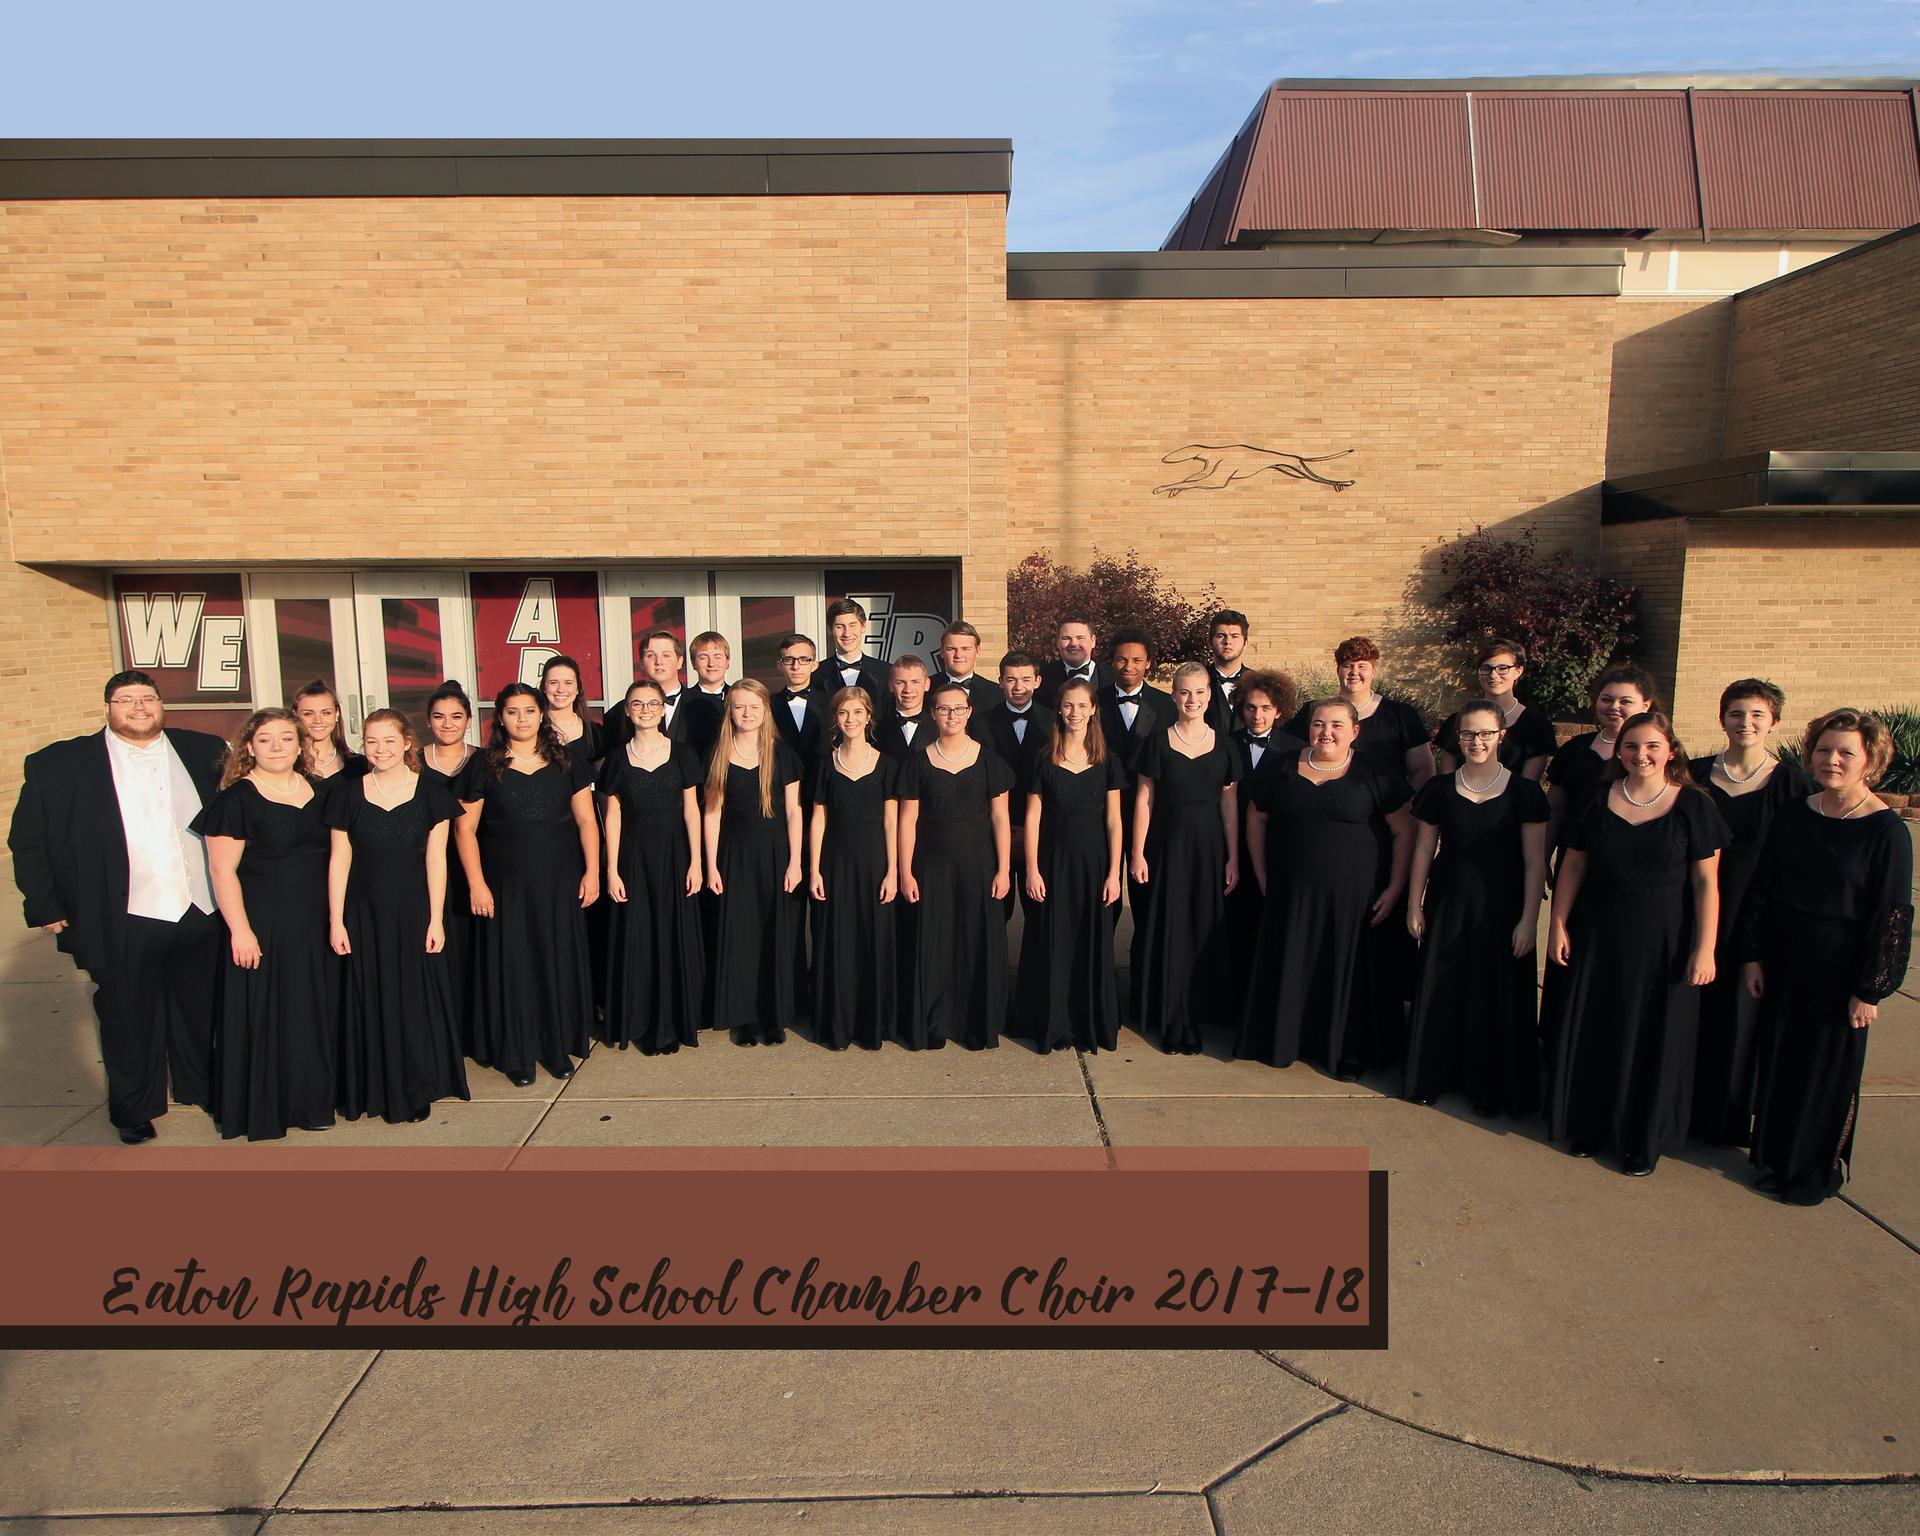 2017-2018 Chamber Choir